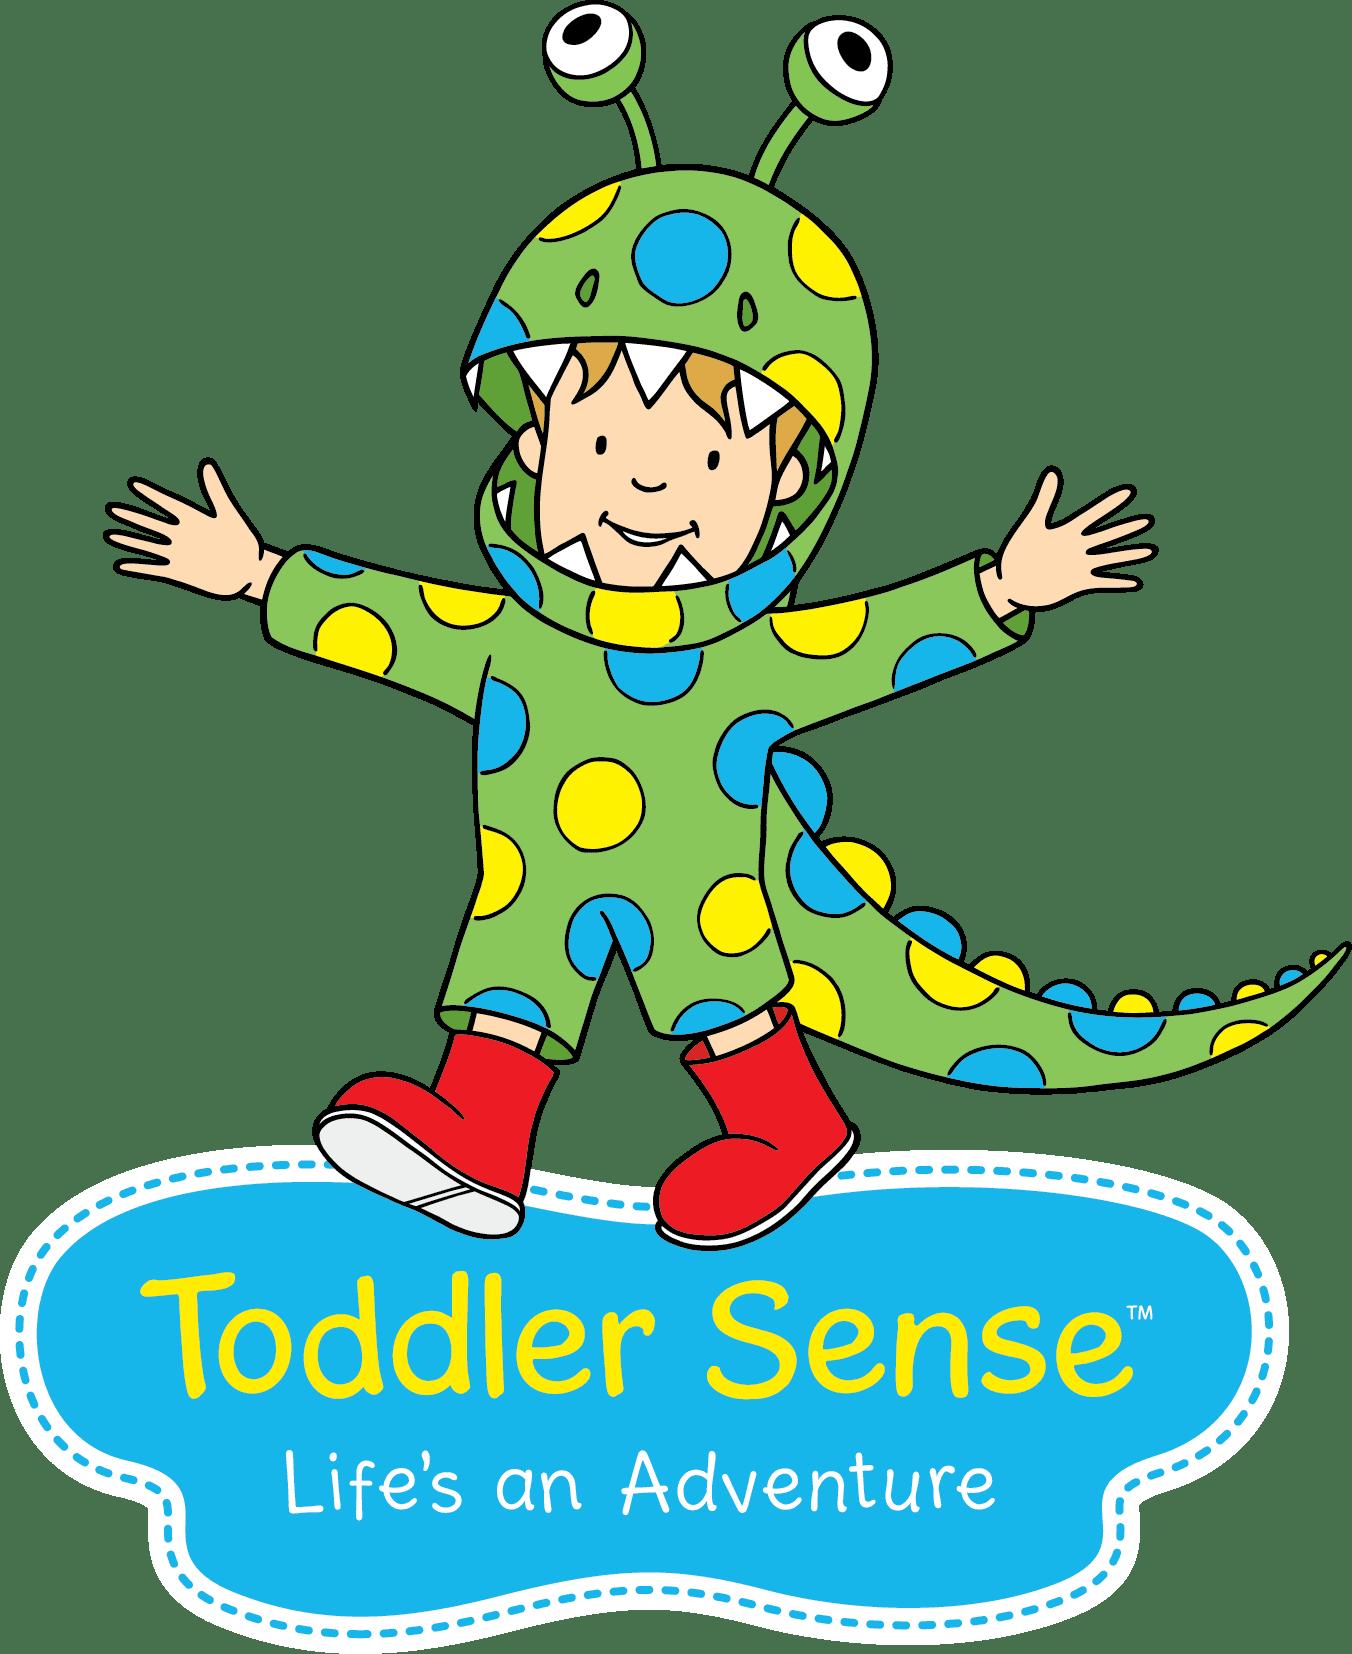 Toddler-Sense-primary-logo-2-club51jjg